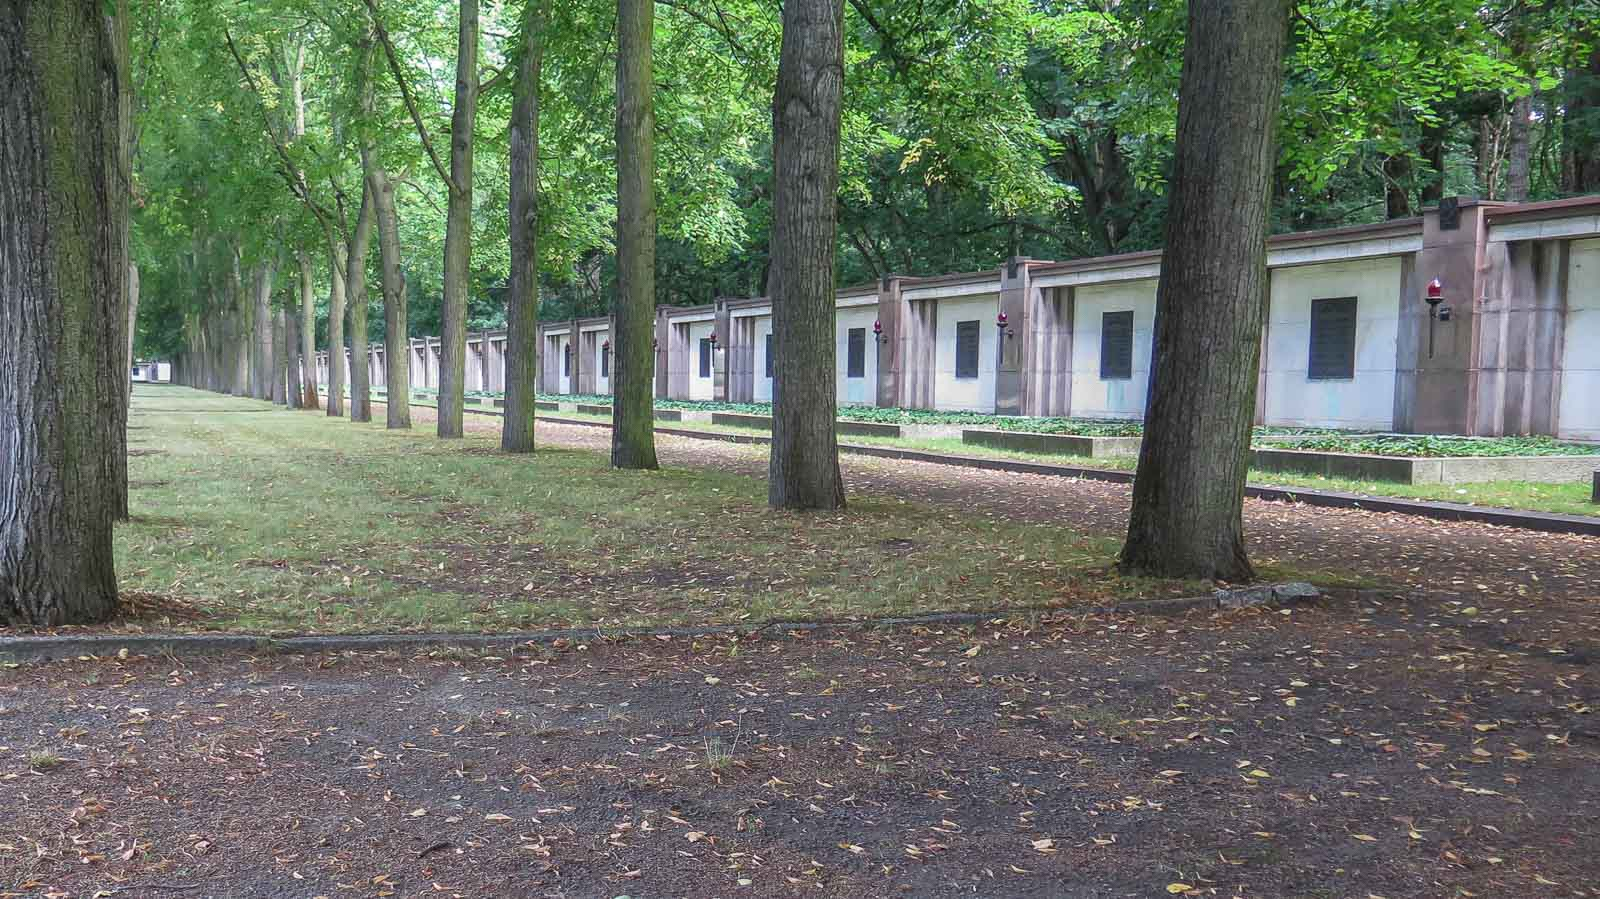 Sowjetischer Soldatenfriedhof Schönholzer Heide Berlin